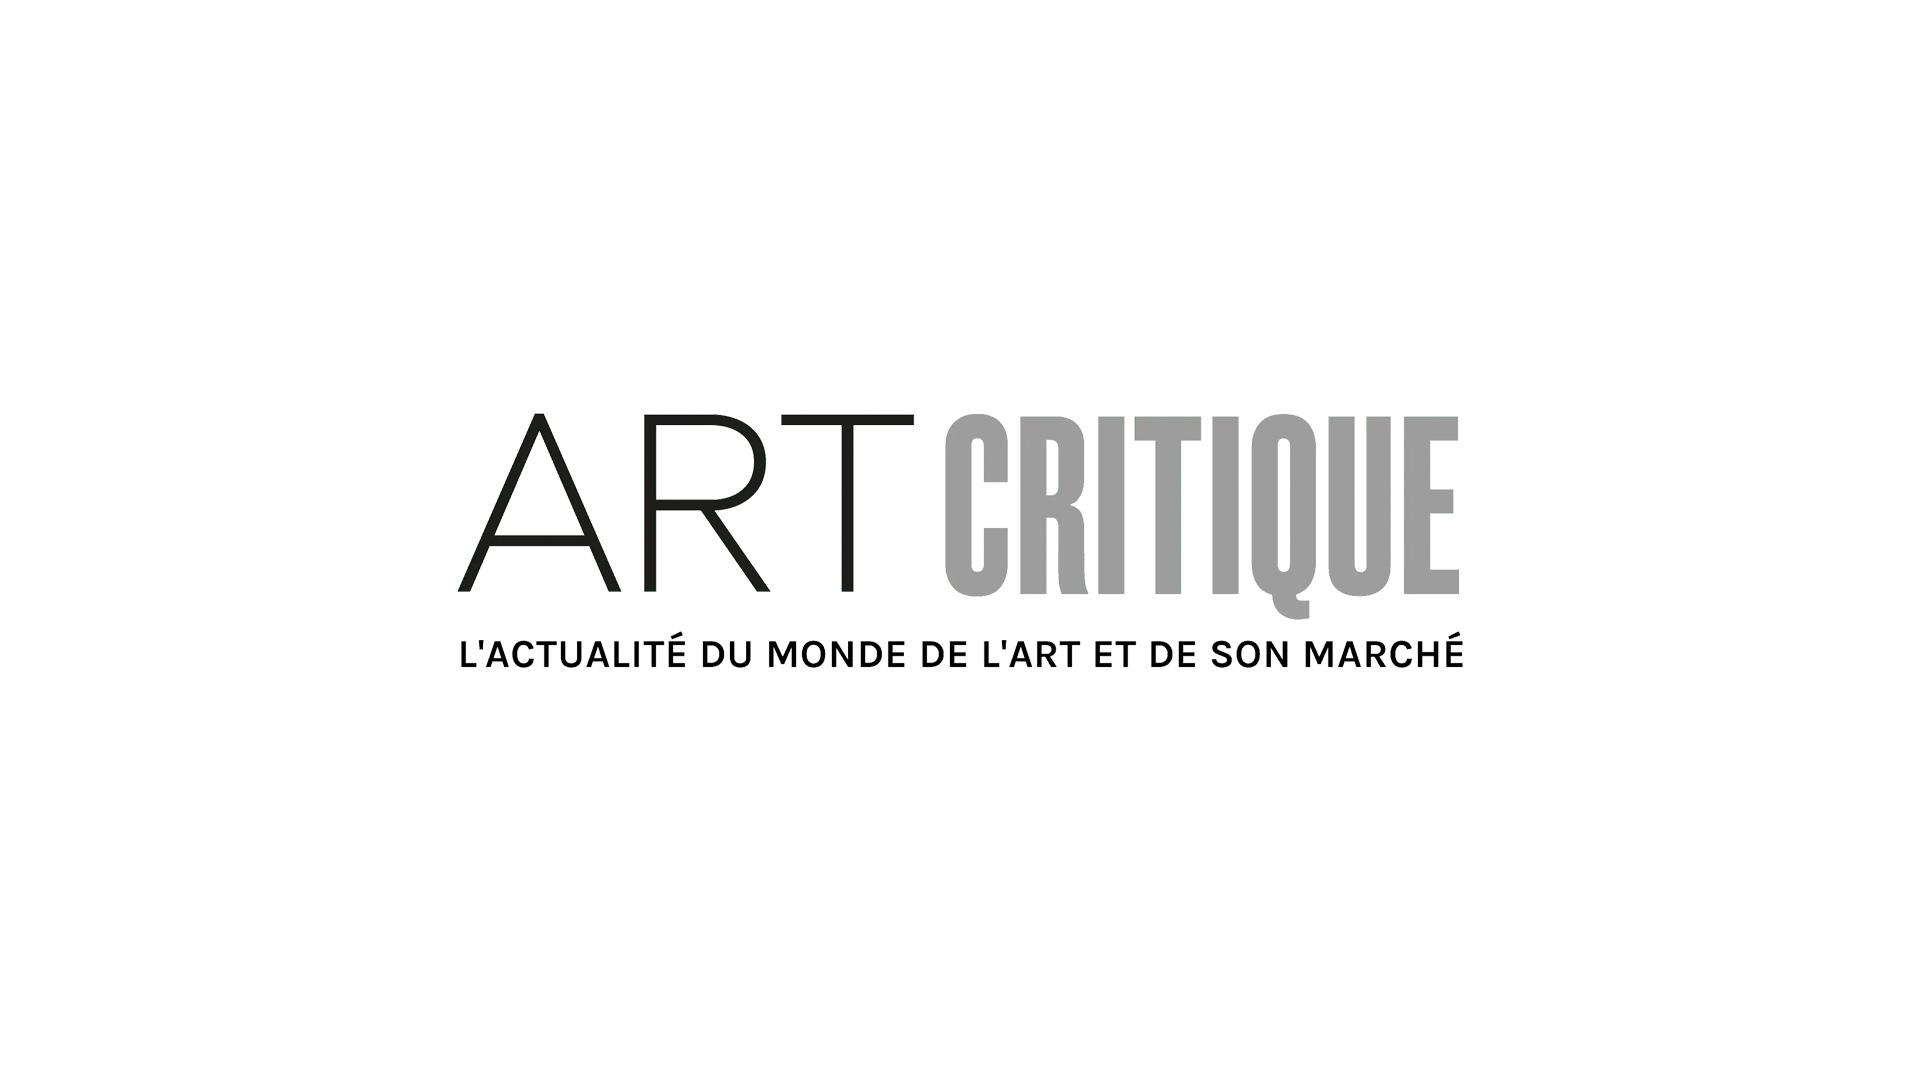 Une exposition sur le Marquis de Sade et Alberto Giacometti